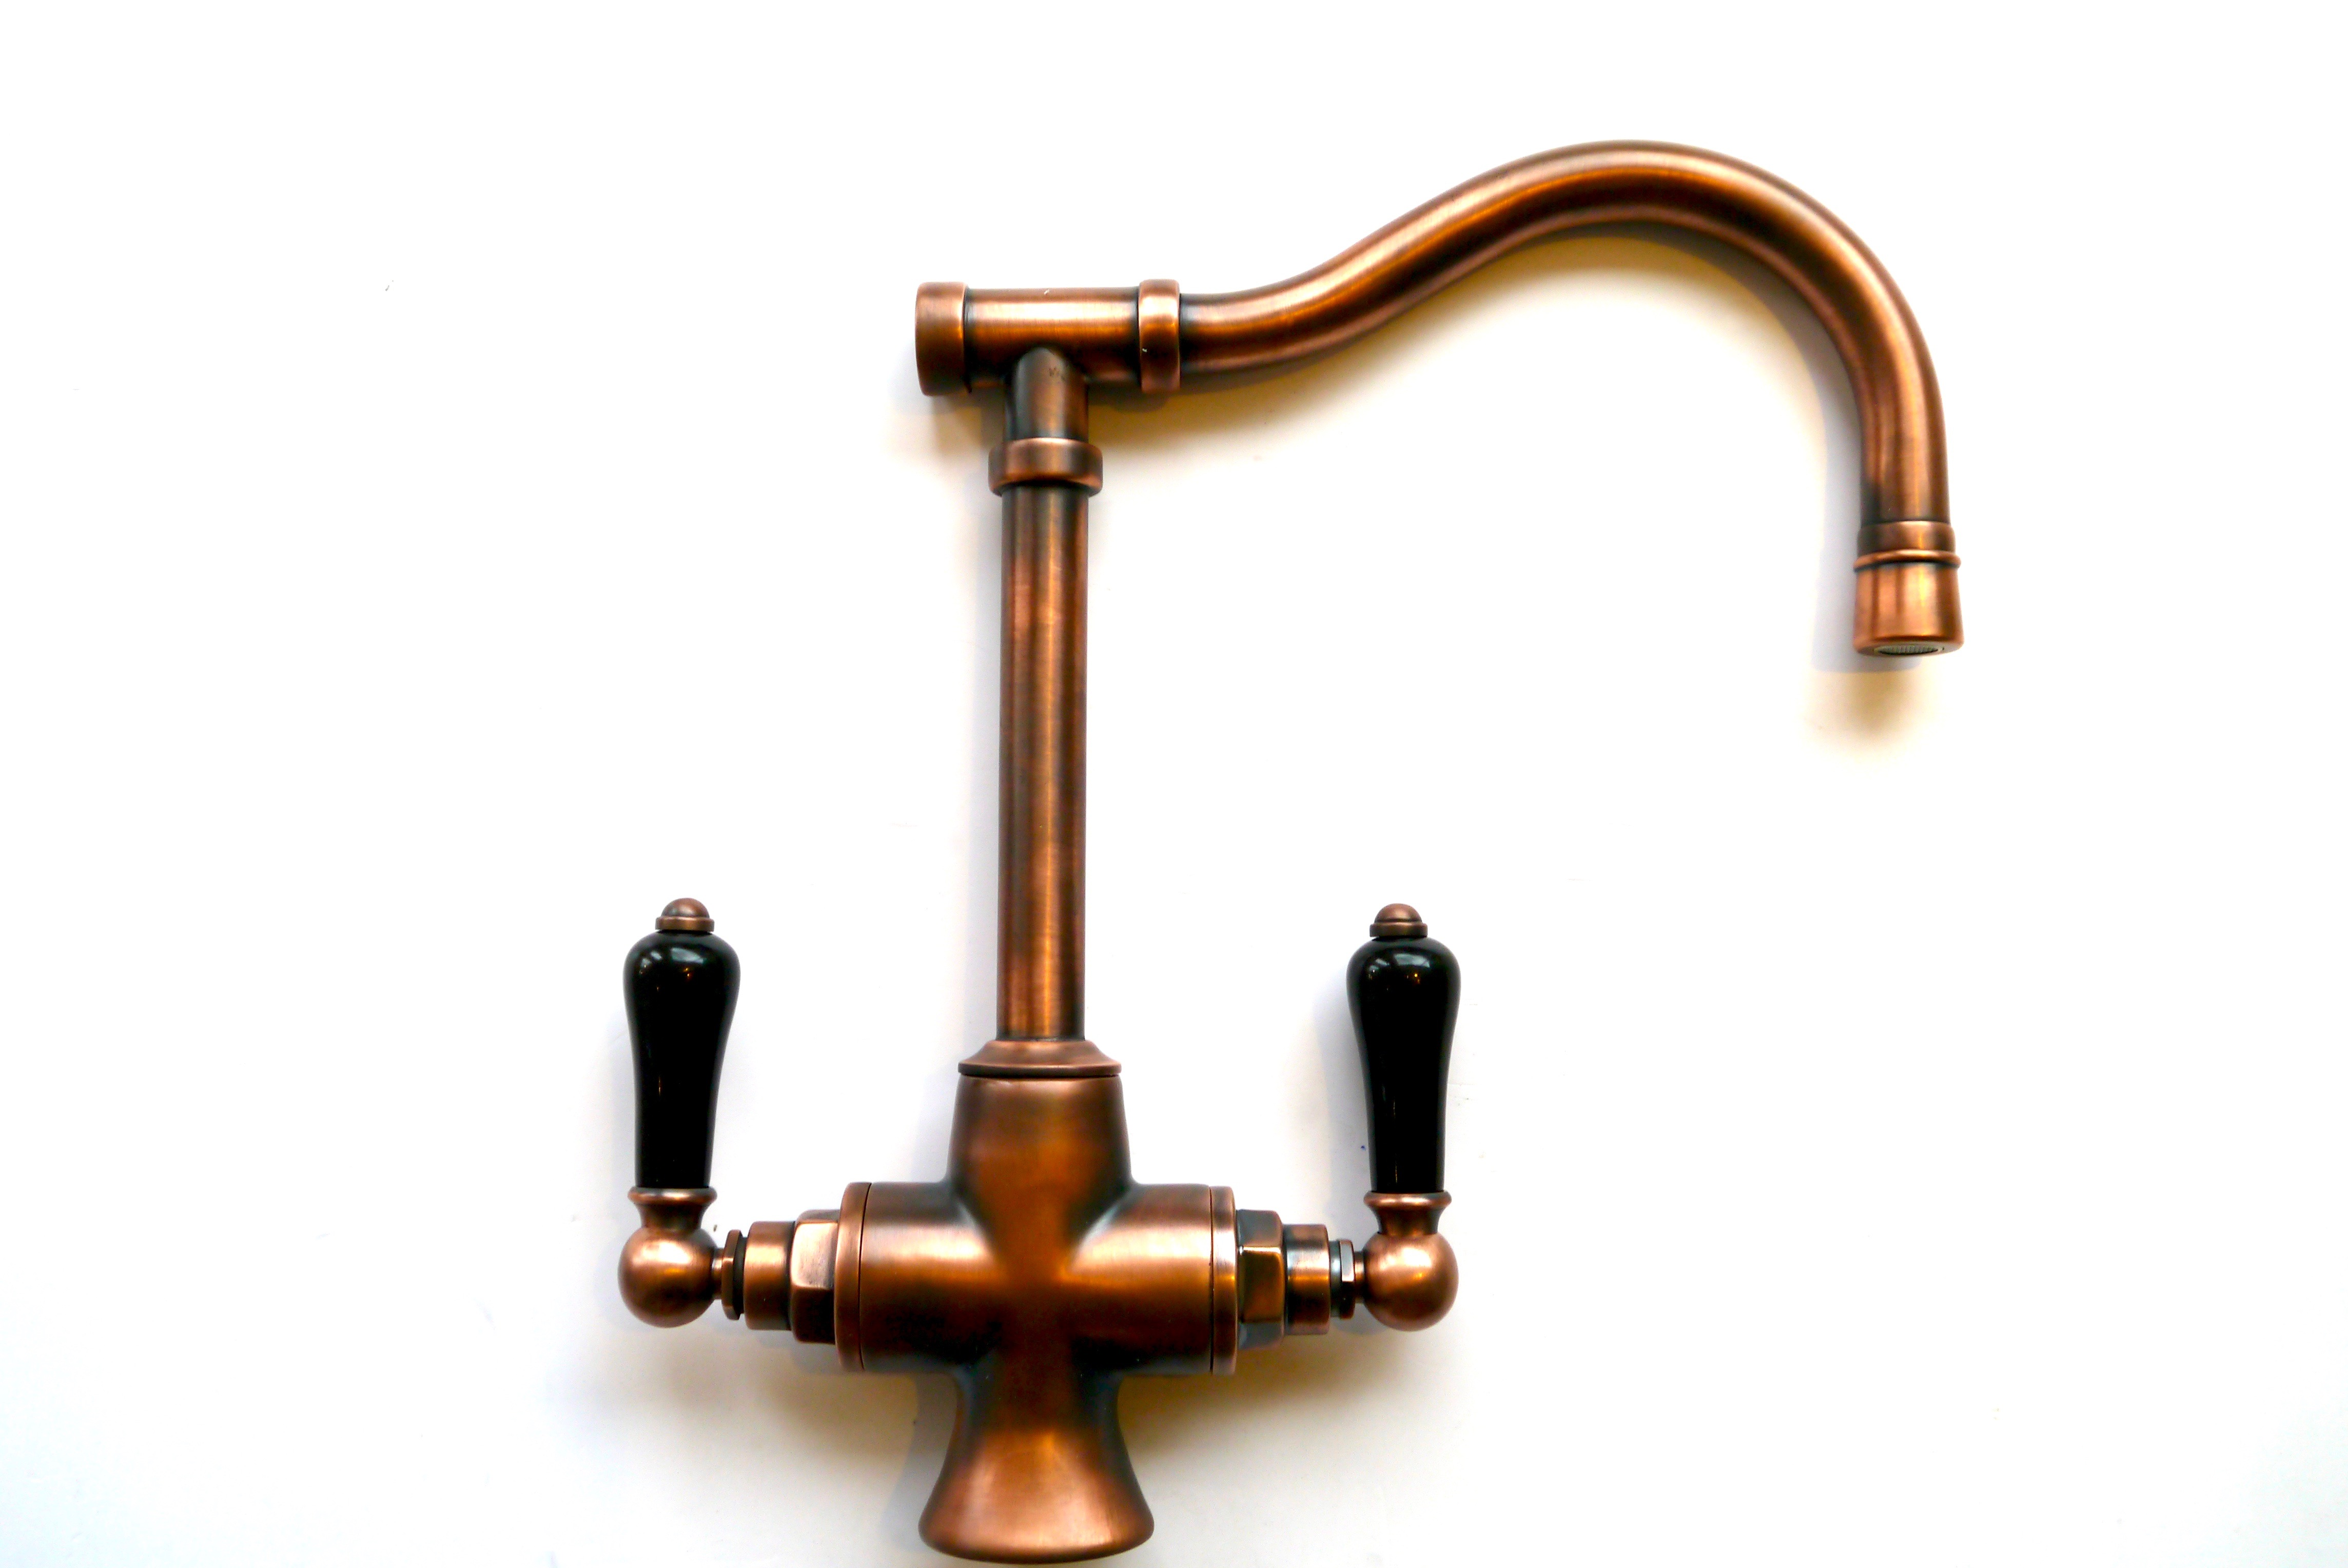 copper or faucets faucet bronze handle single bar tru of premier products antique best bathroom